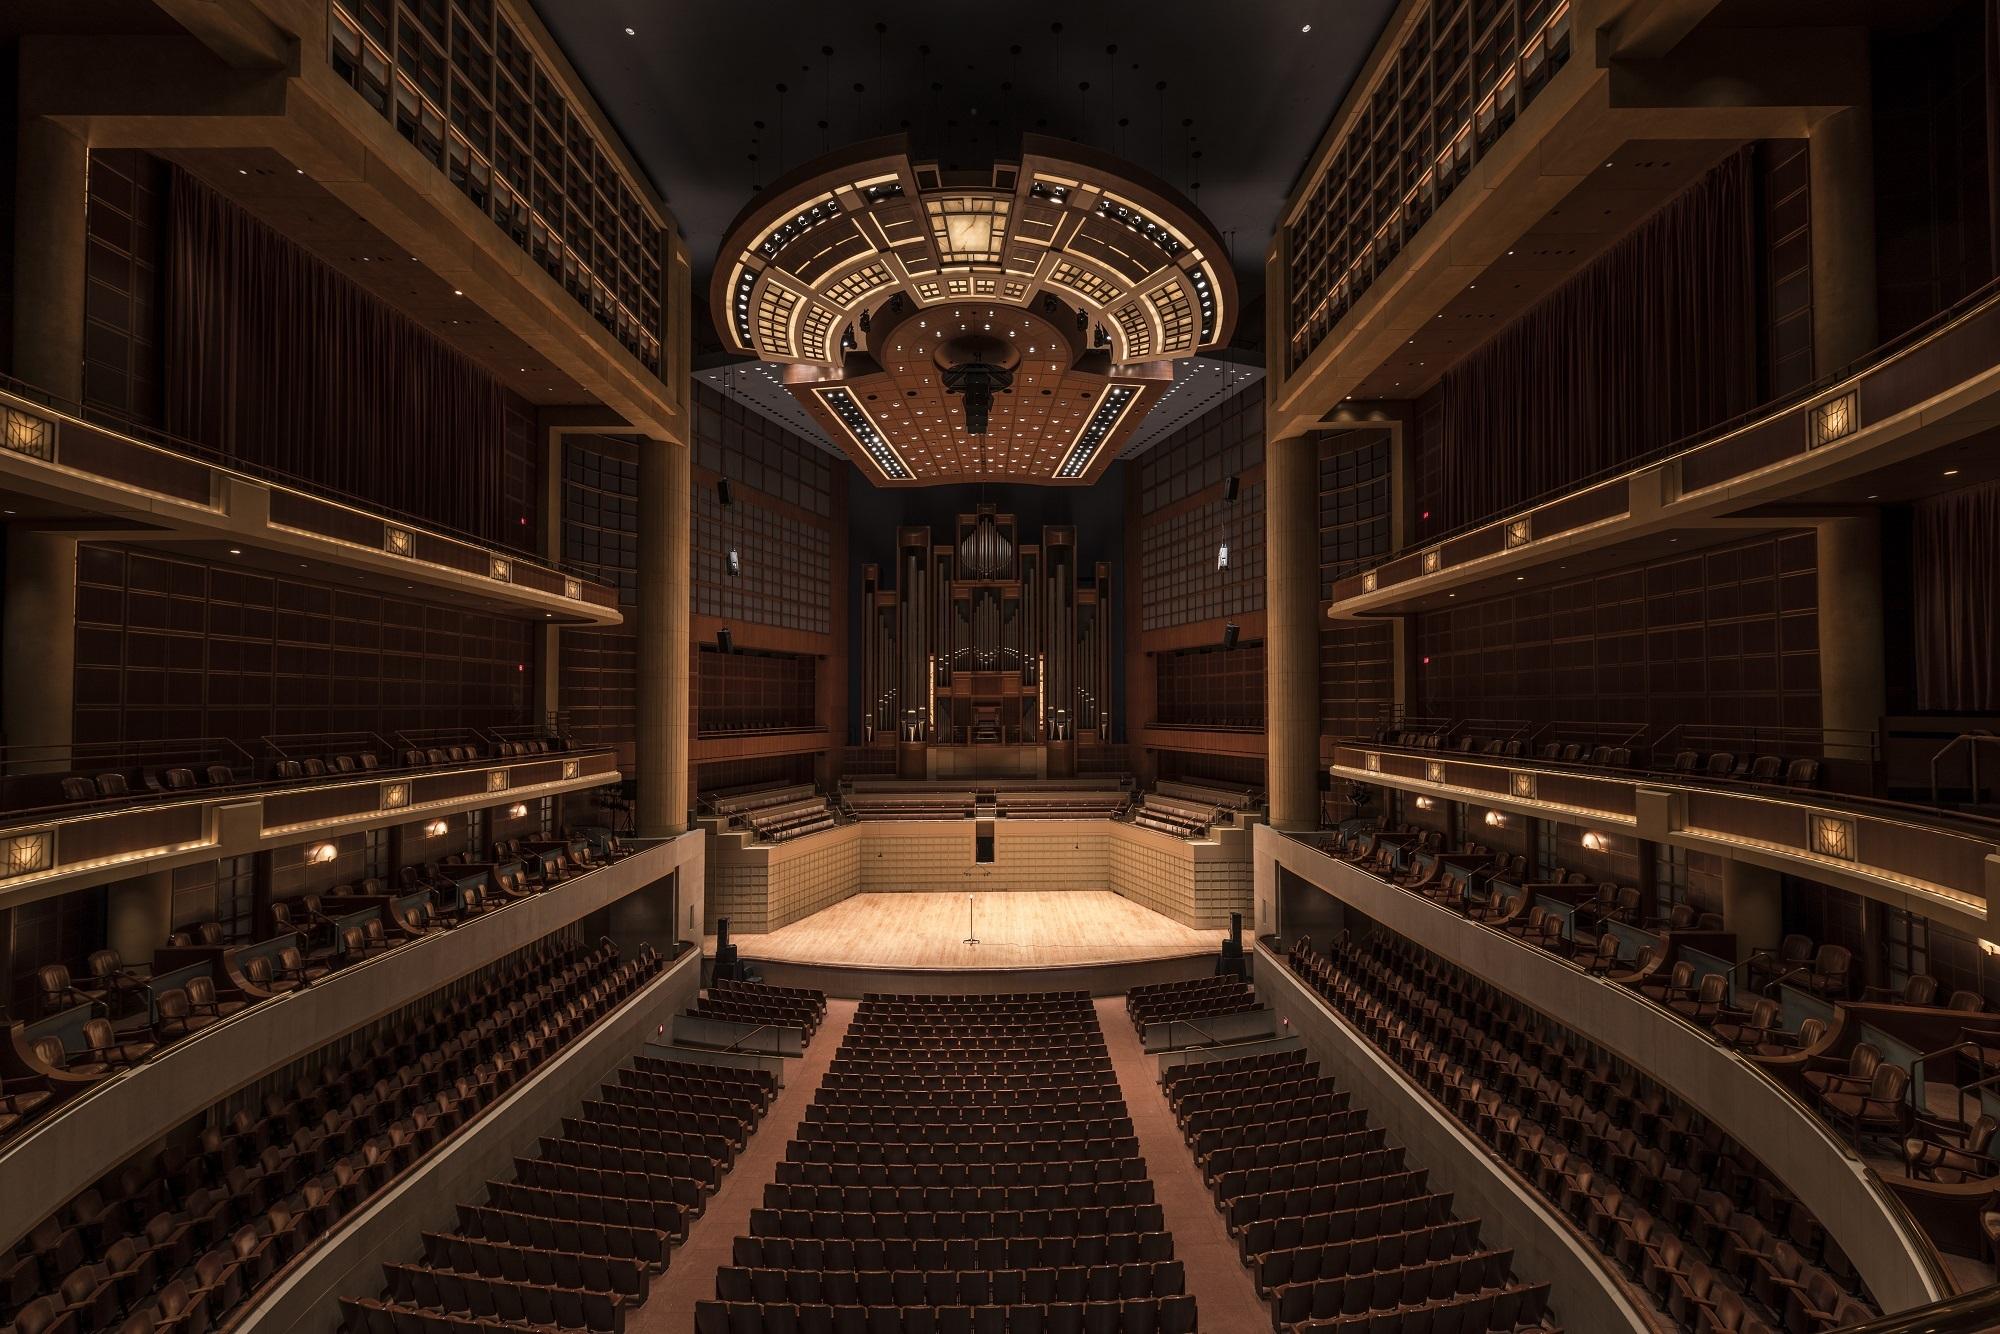 Symphony hall photo